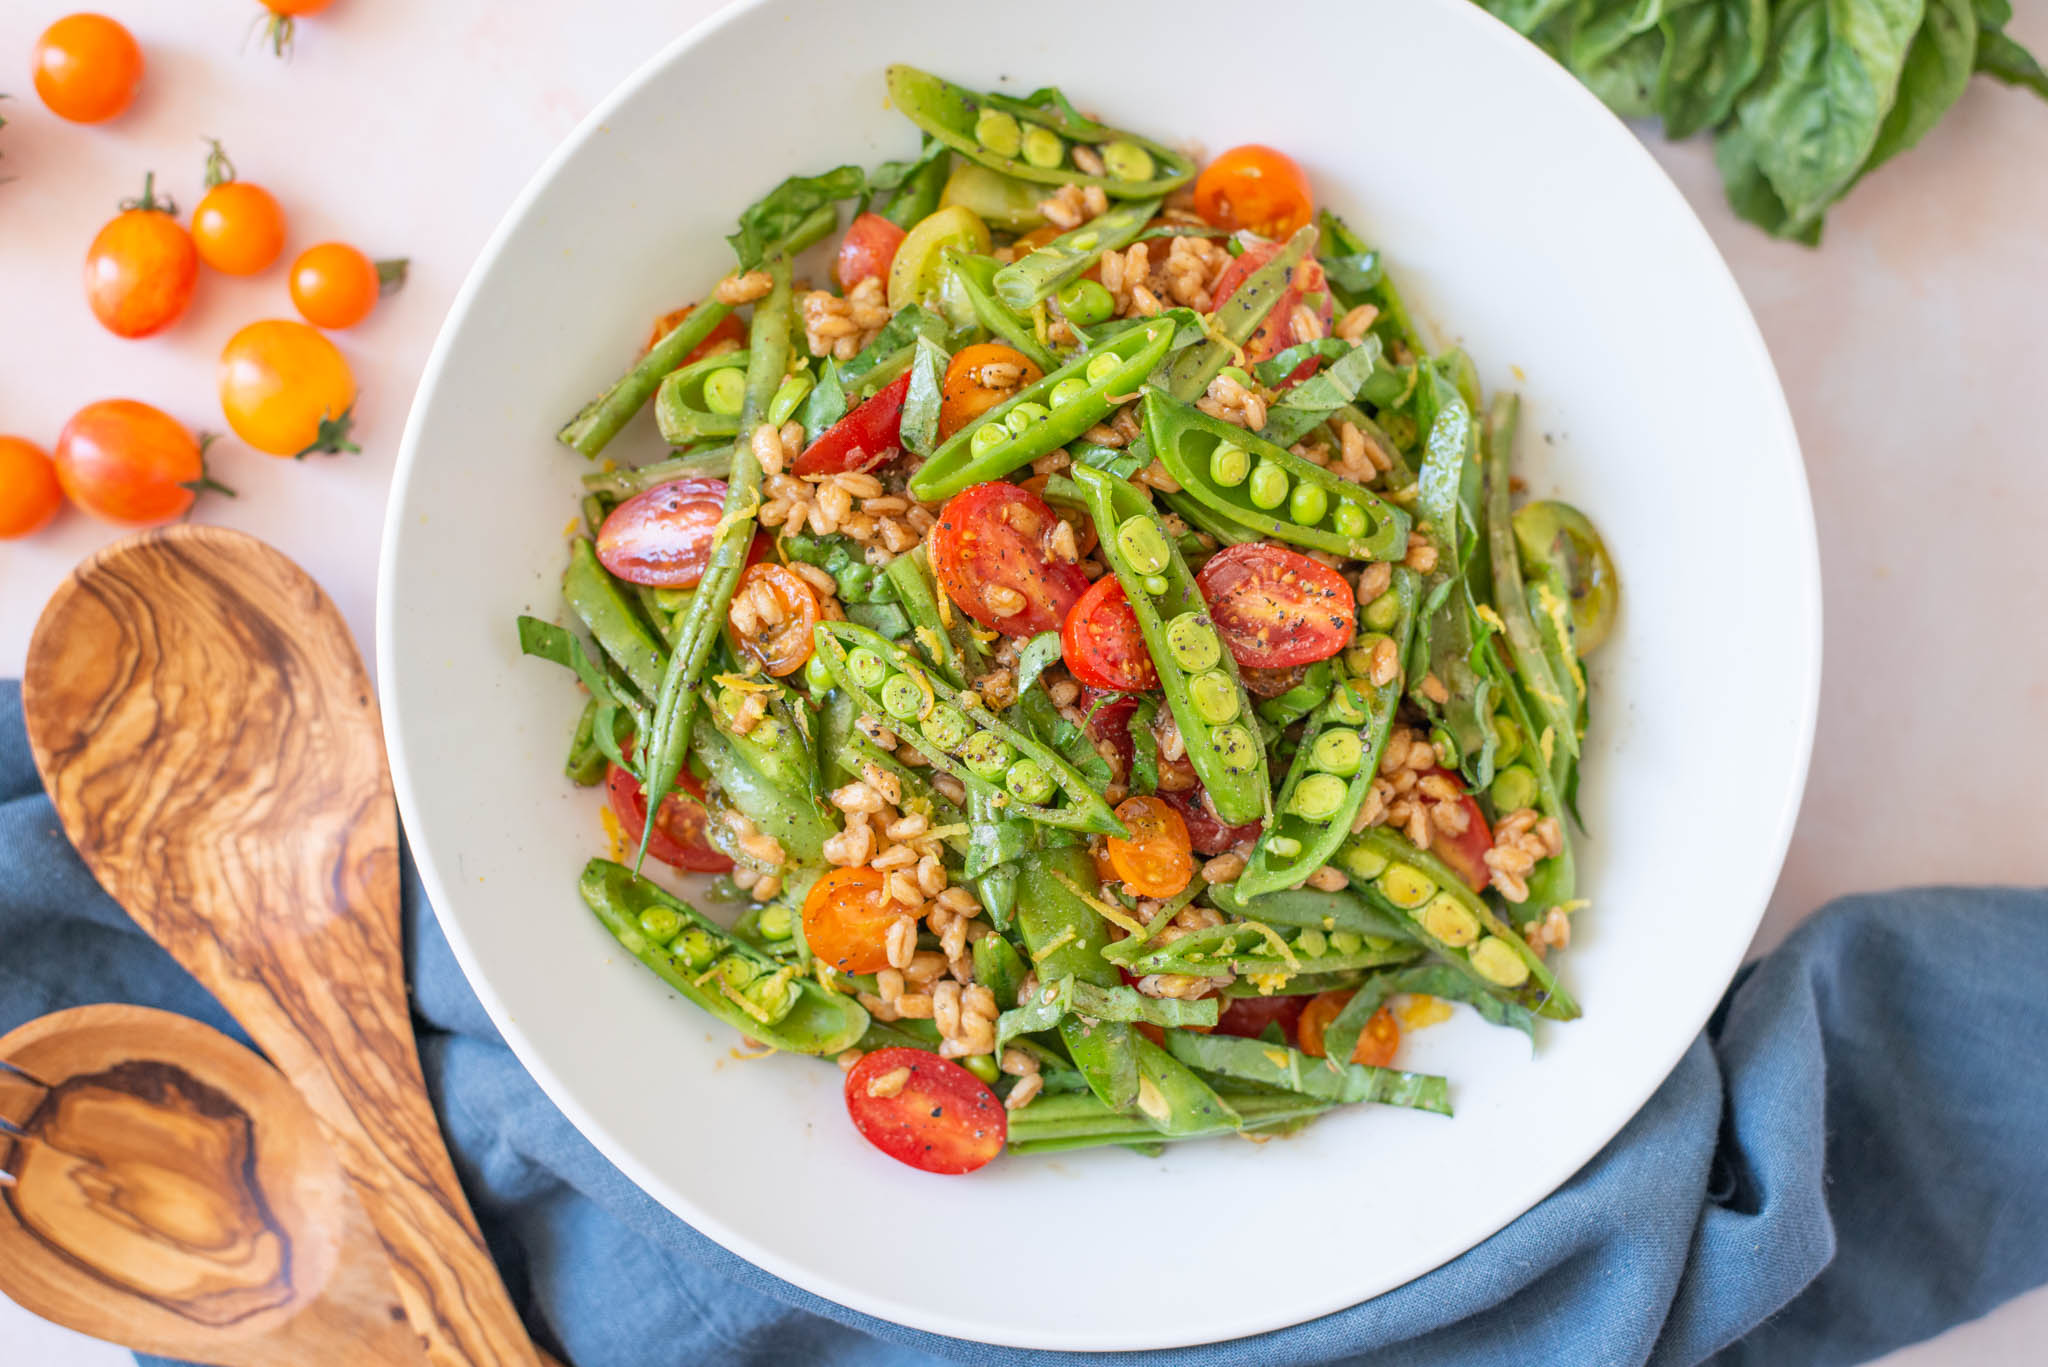 Mixed_And_Measured_Snap_Pea_Farro_Salad-5.jpg